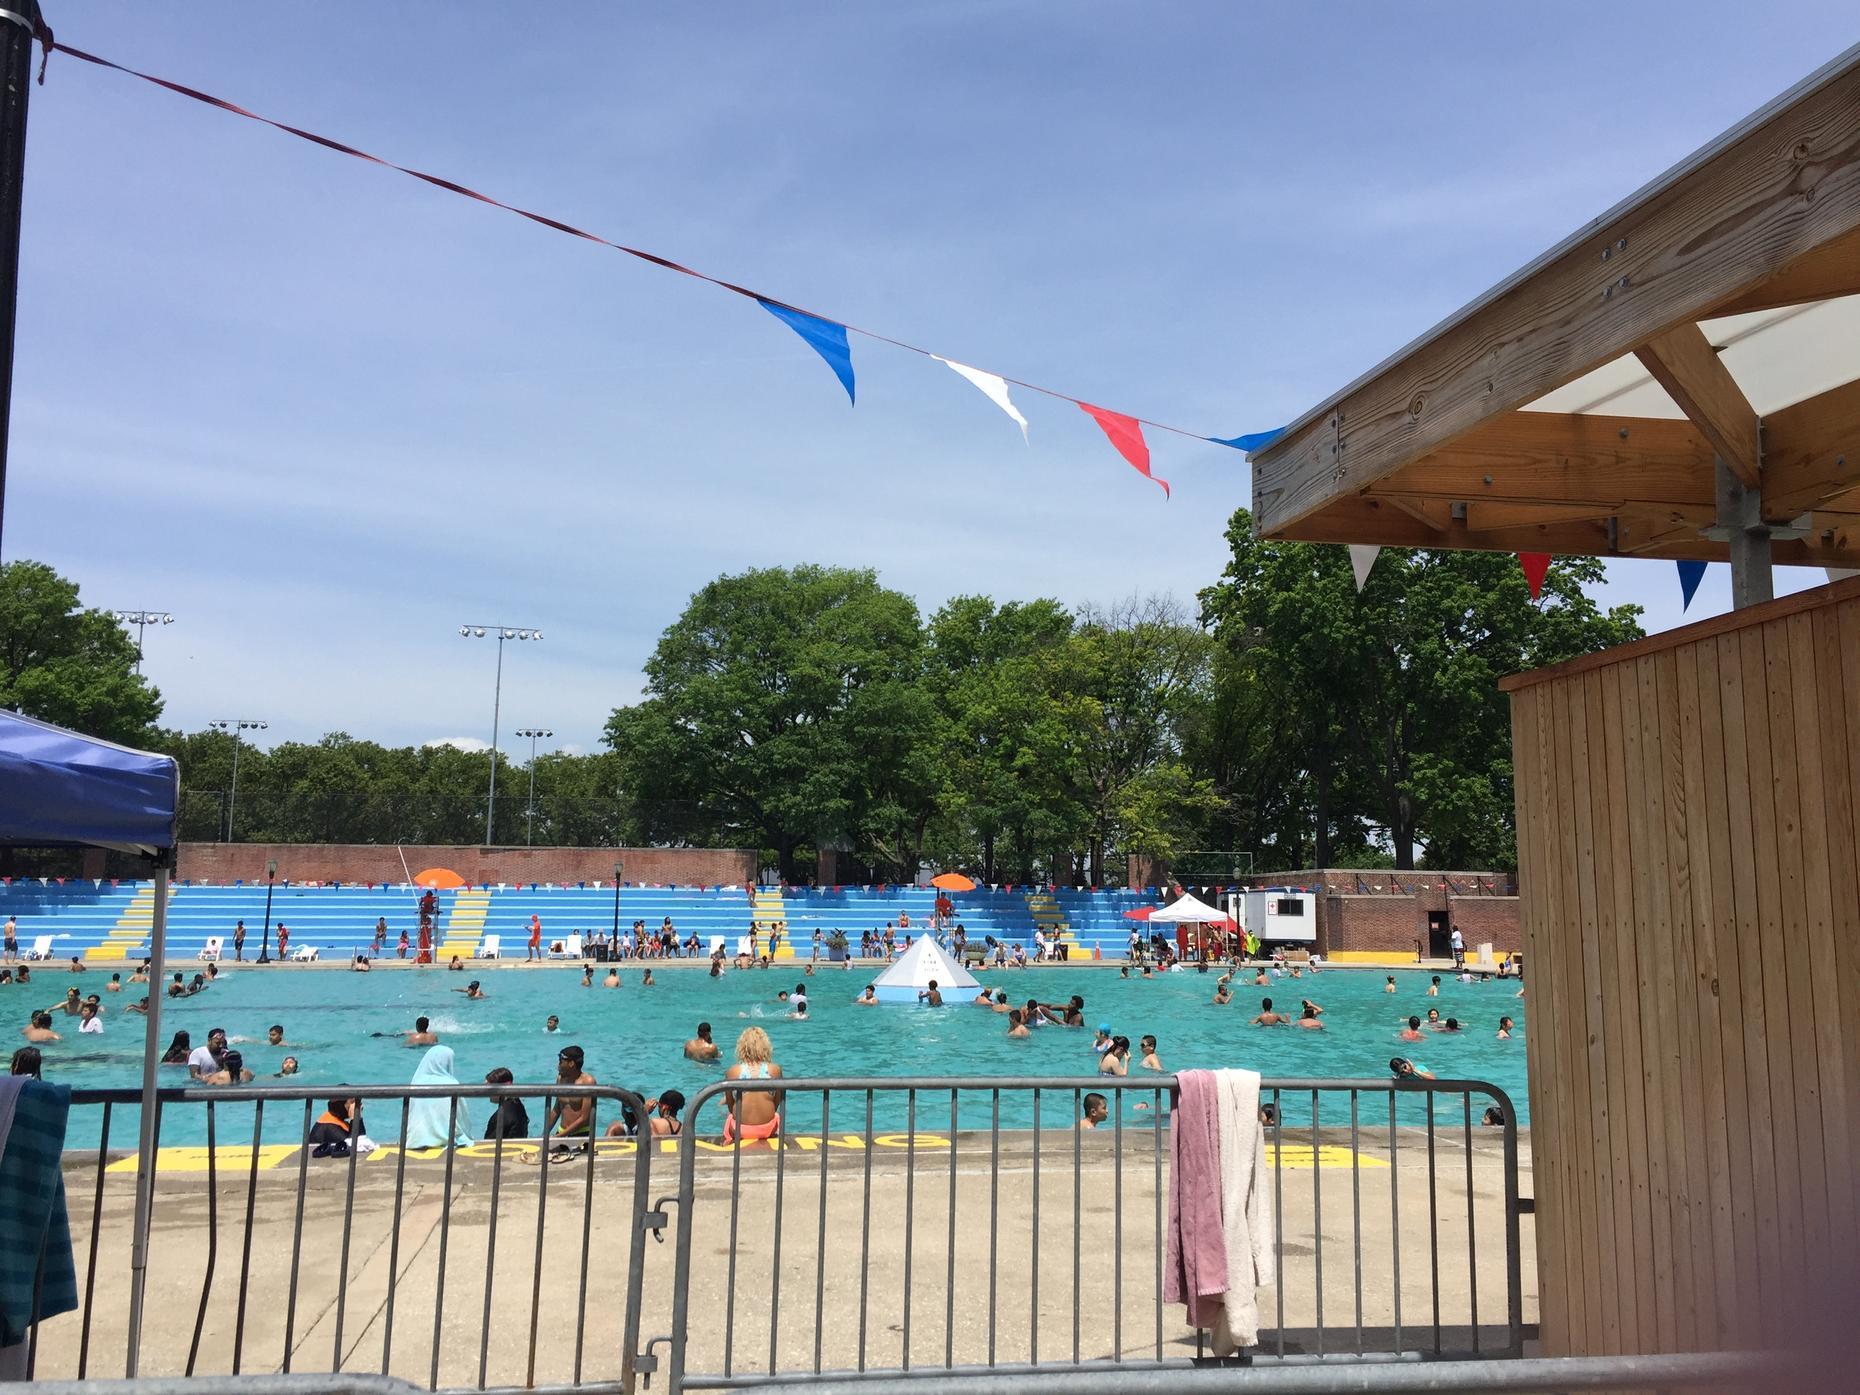 Free Summer Stuff Nyc 39 S Public Pools Wnyc New York Public Radio Podcasts Live Streaming